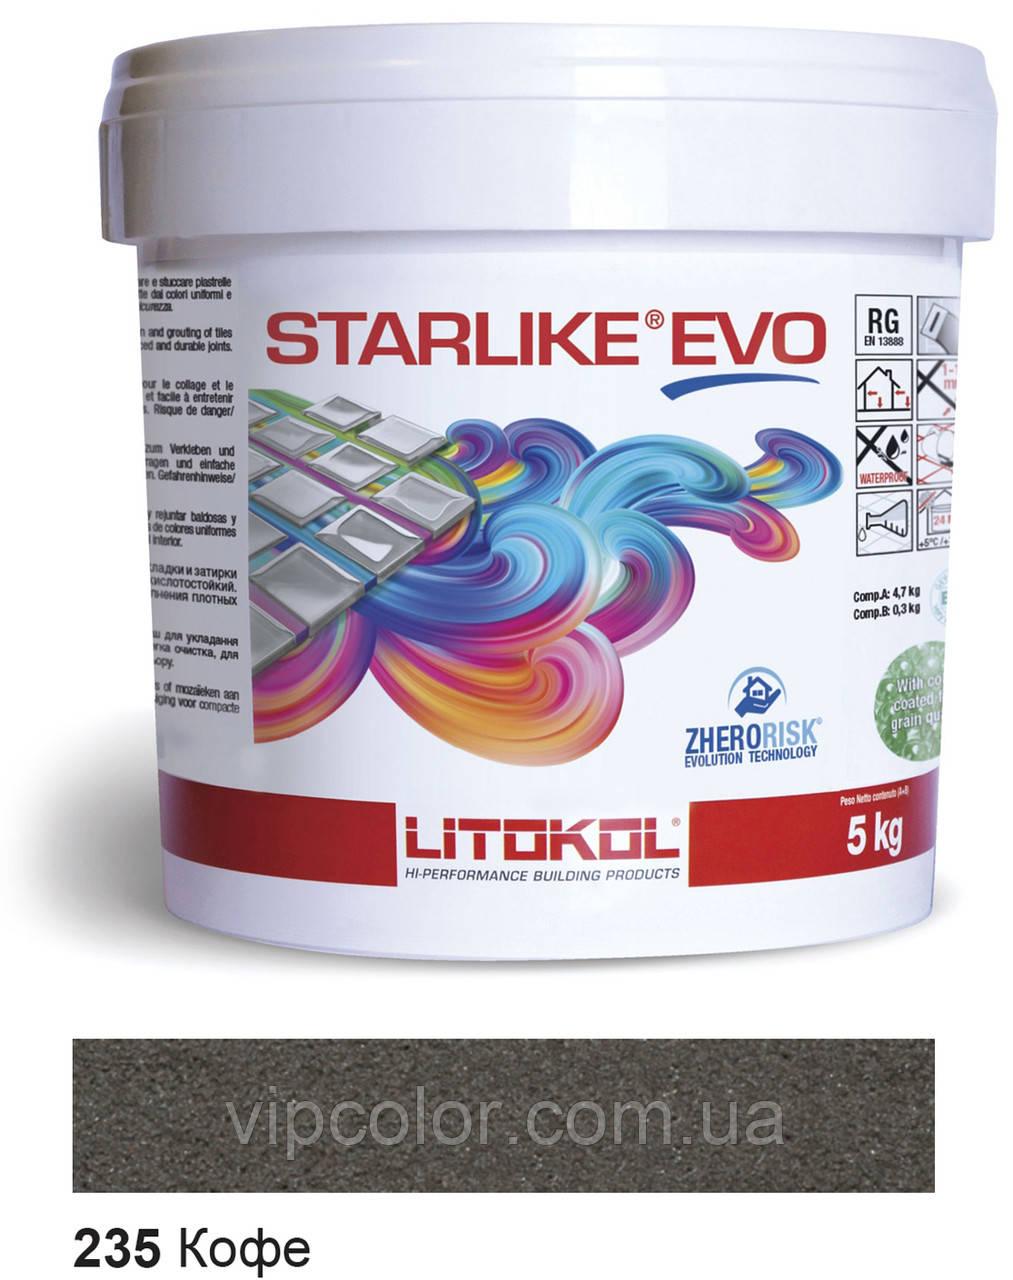 Litokol Starlike EVO 235 КОФЕ 5 кг - эпоксидная двухкомпонентная затирка - Warm Collection